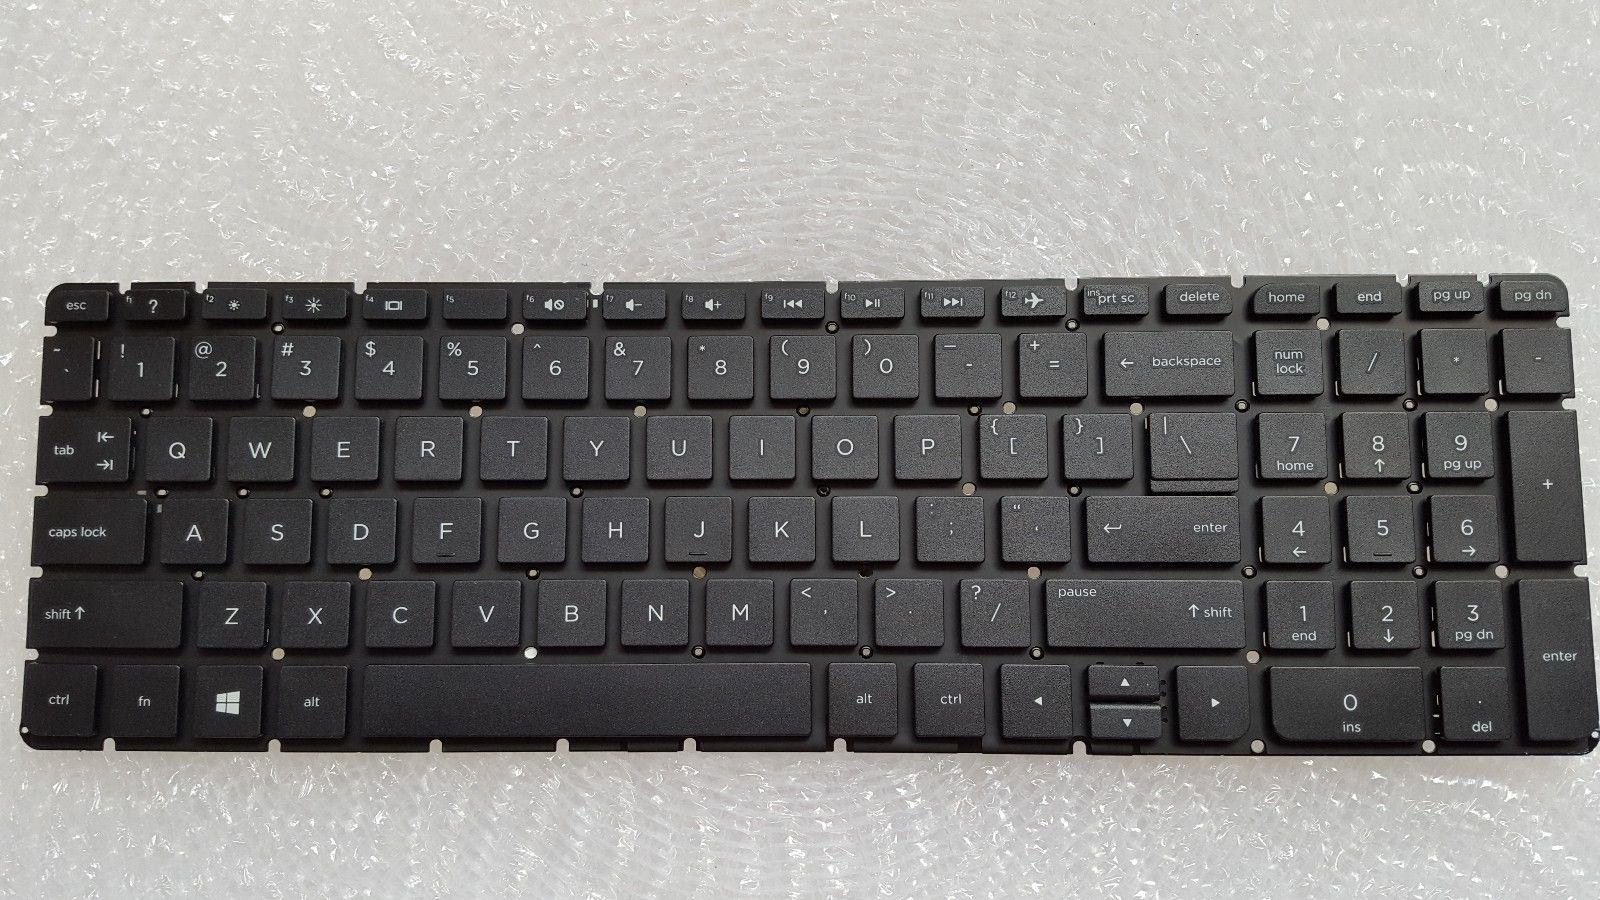 Jual Keyboard Hp 15 Ba004ax Black Us Inch Sparepart Computindo Notebook Tokopedia